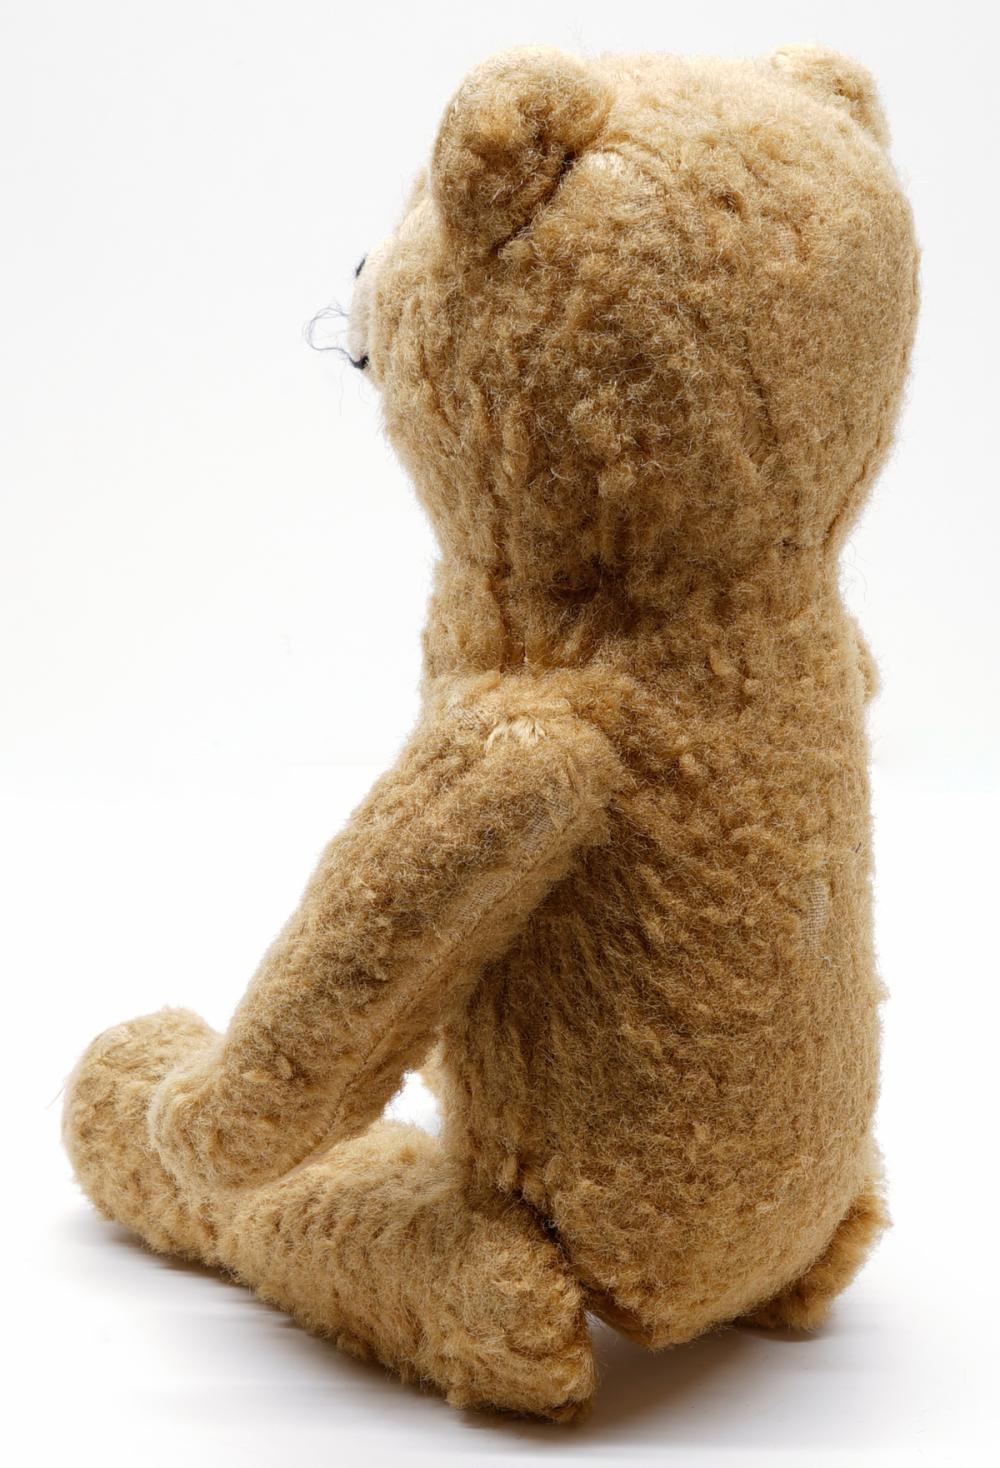 Lot 187: Vintage Teddy Bear